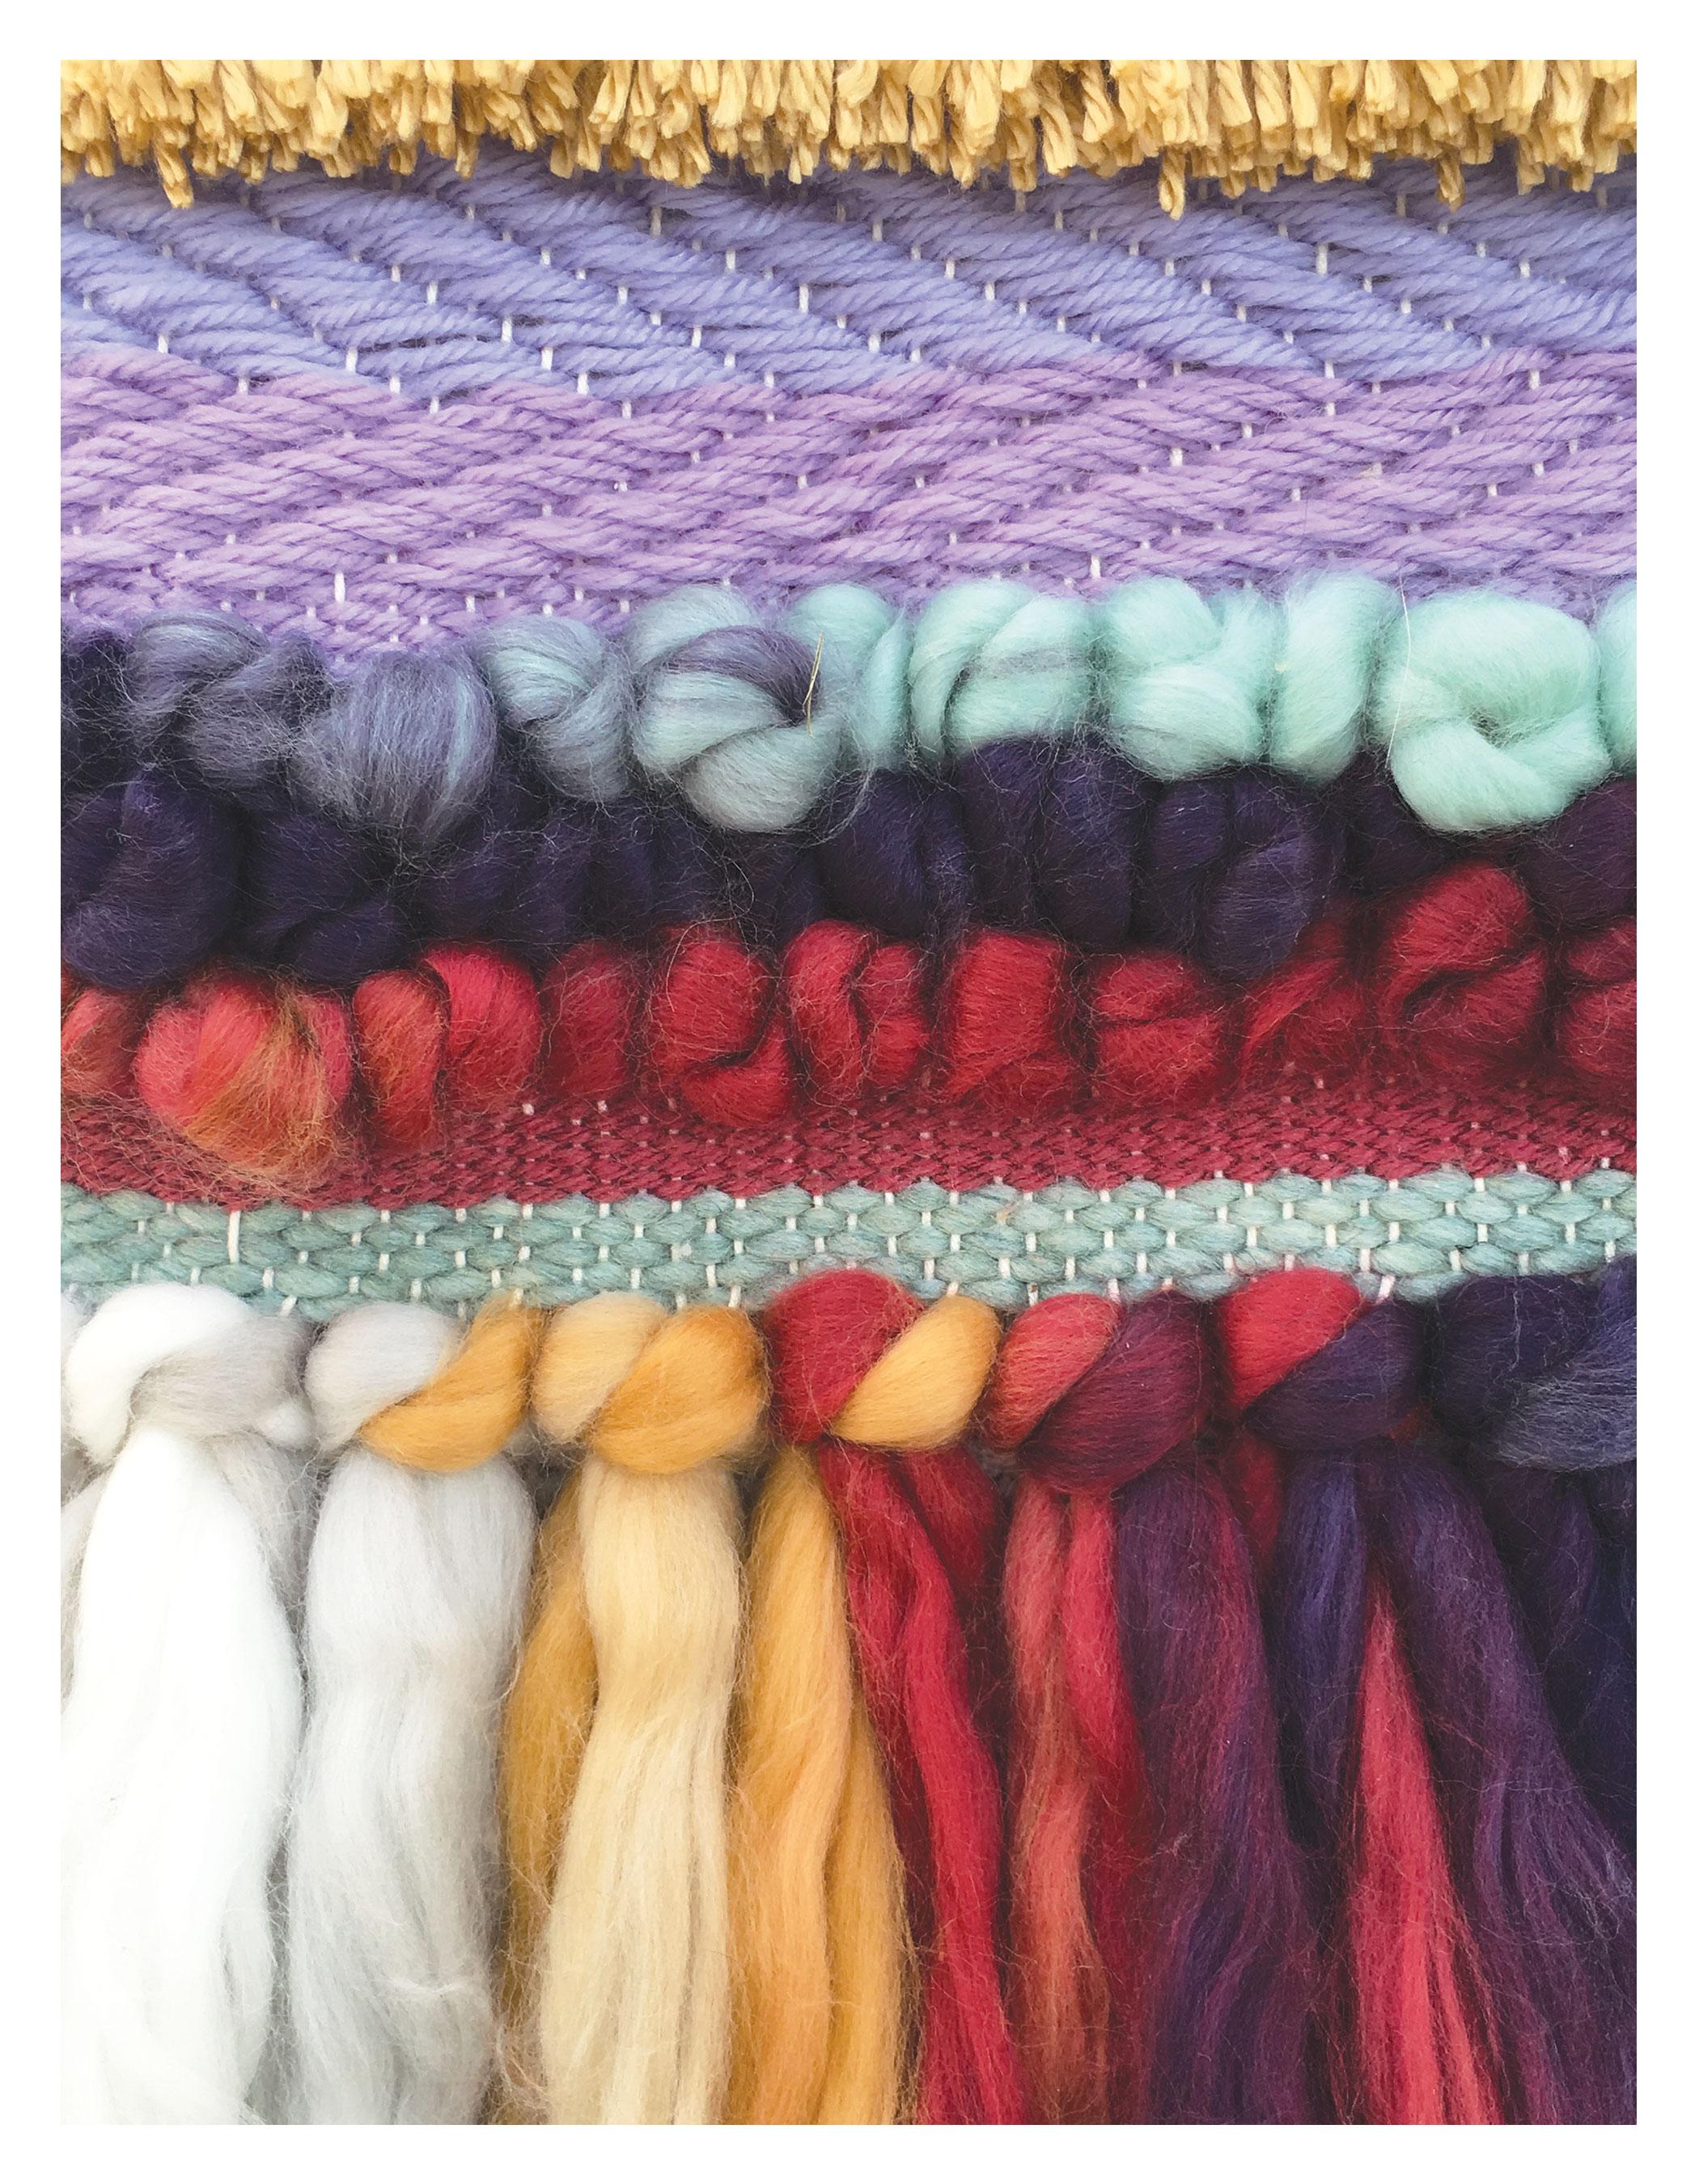 weaving-5.jpg